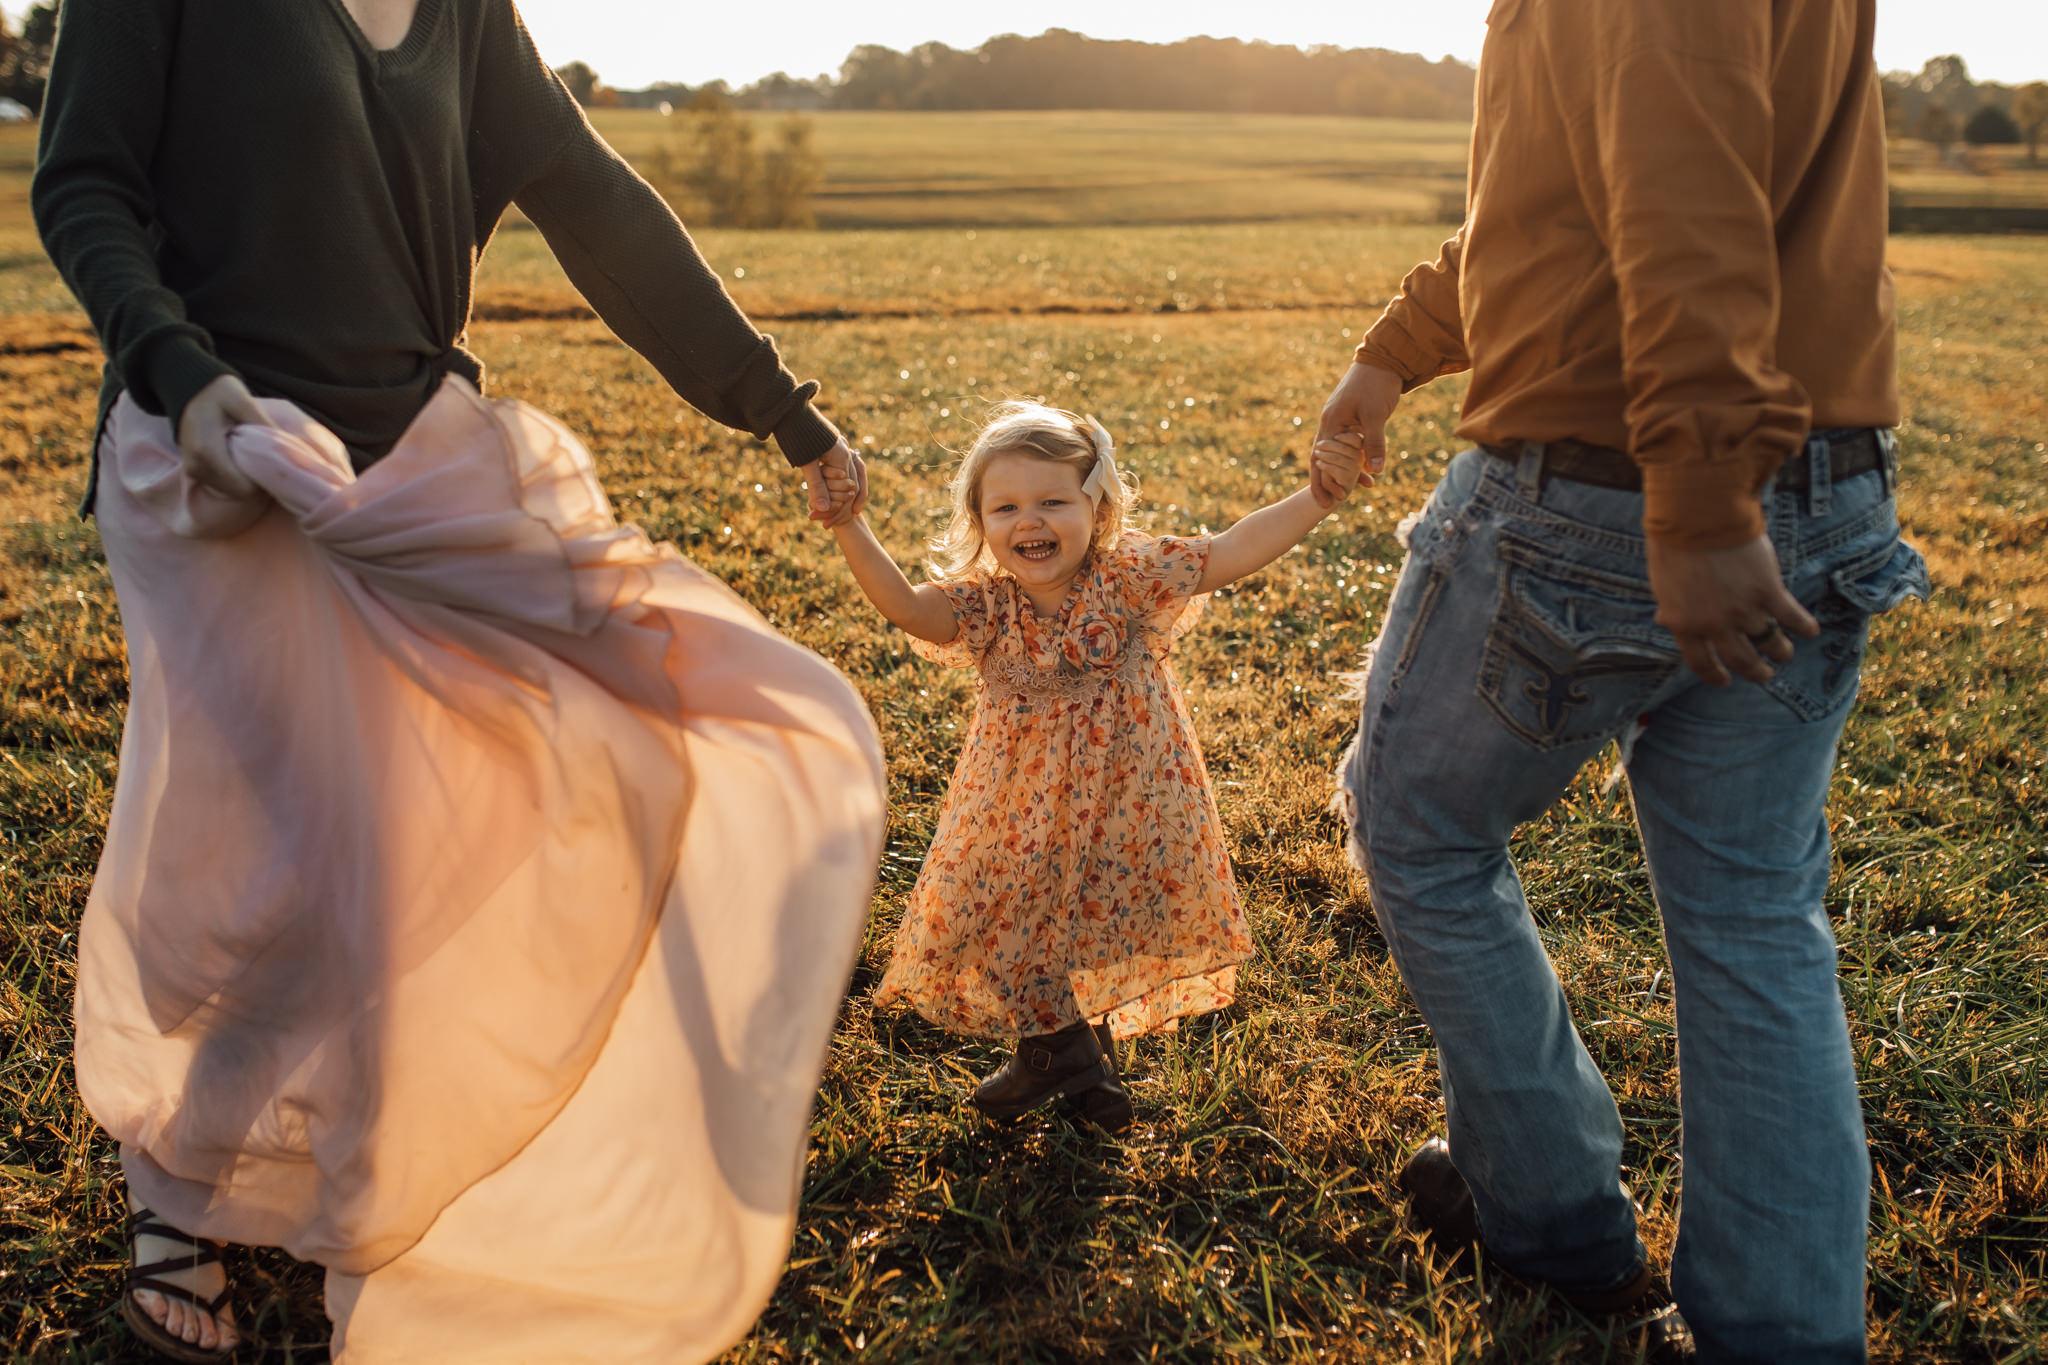 cassie-cook-photography-memphis-family-photographer-lifestyle-family-photographer-sunrise-gray-family-66.jpg